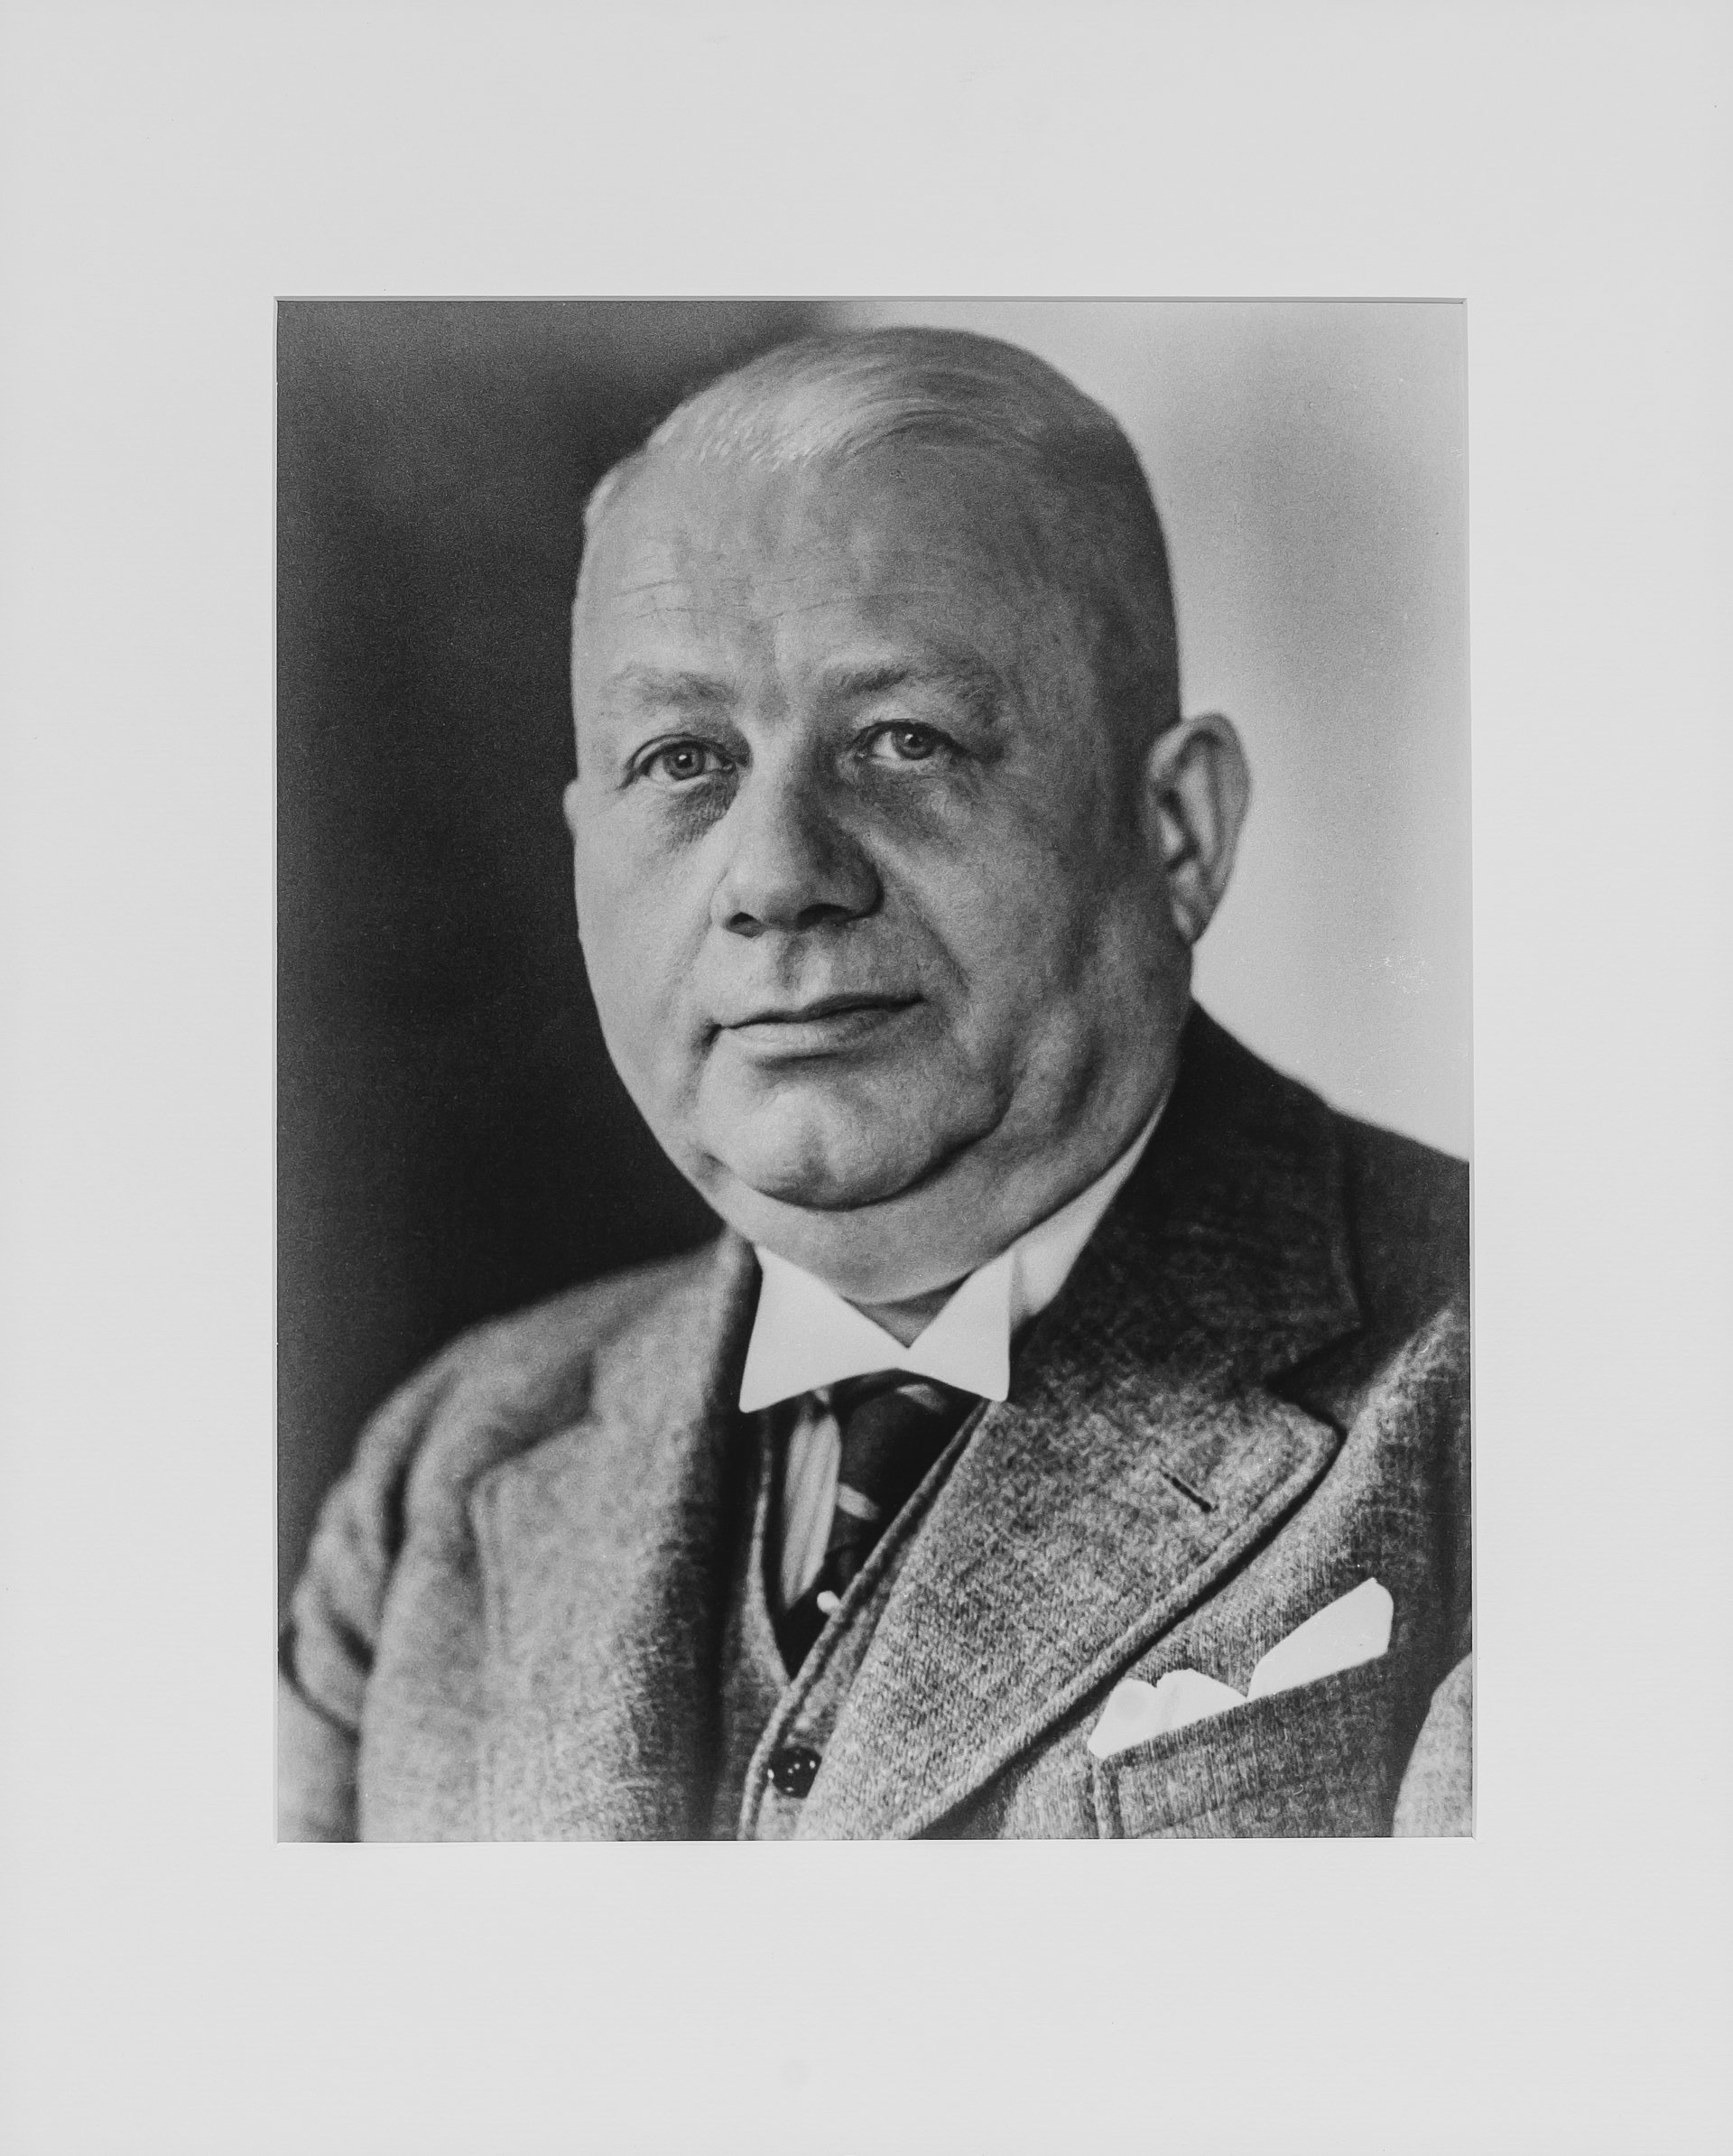 Josef Boltersdorf Papiermacher in Kreuzau